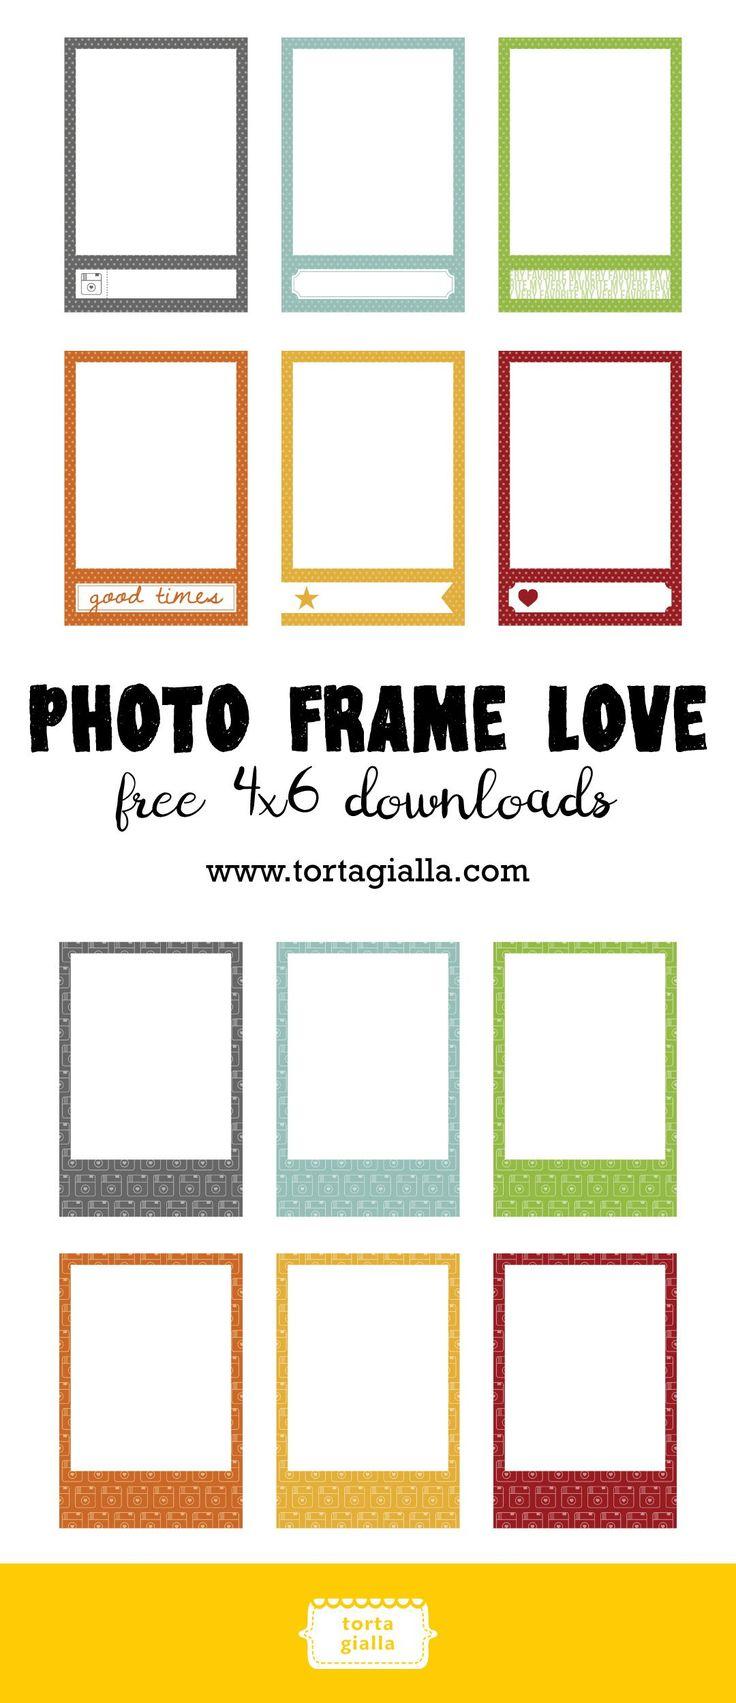 Free 4x6 Photo Frame Love Downloads Tortagialla Picture Frame Template Free Photo Frames Photo Frame